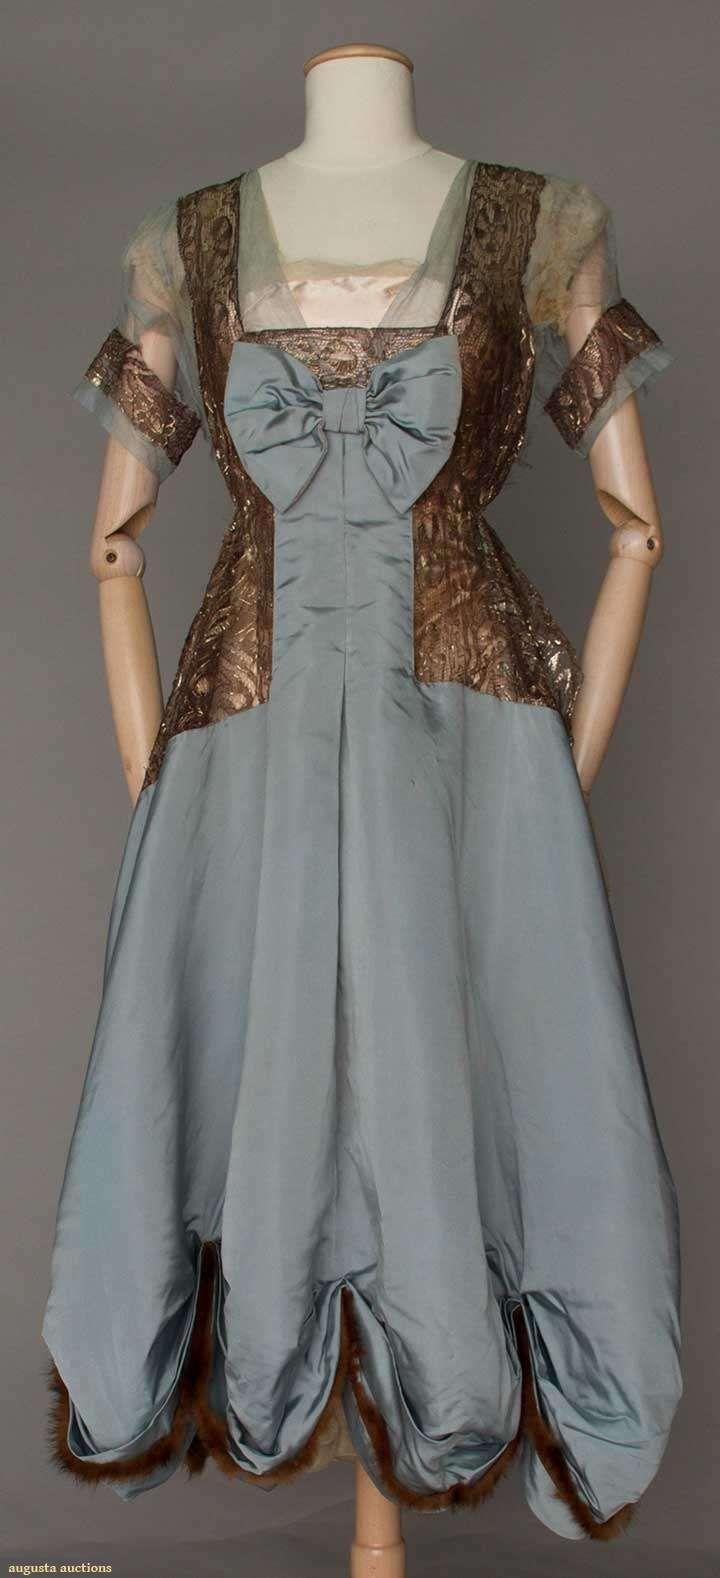 Gown (image 1) | House of Worth | France; Paris | 1916 | silk, fur | Augusta Auctions | April 20, 2016/Lot 211